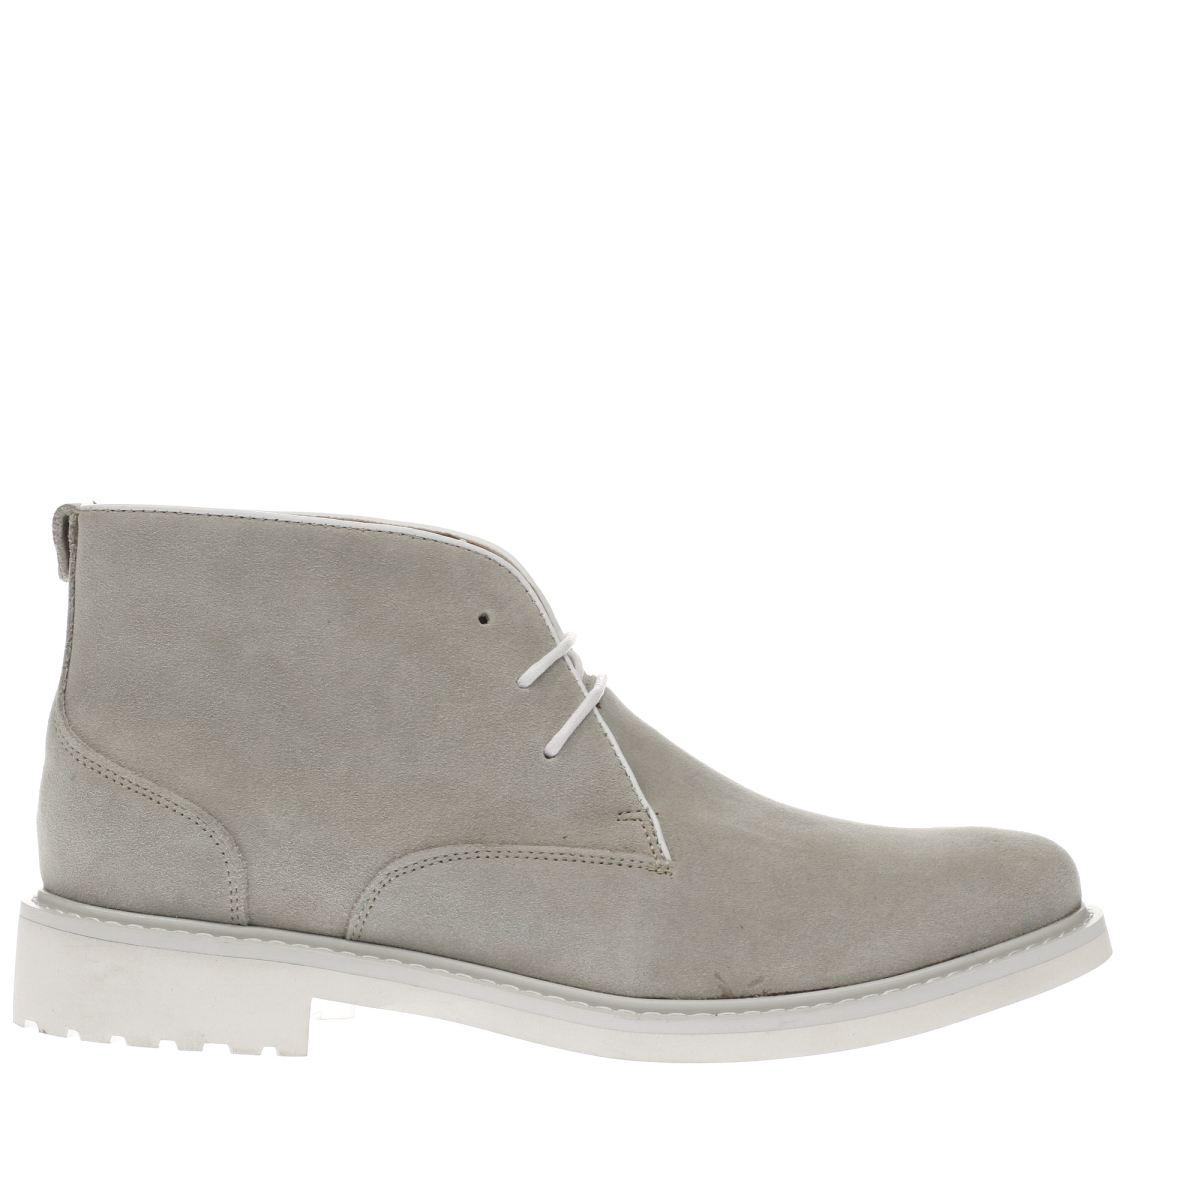 Peter Werth Peter Werth Light Grey Oldman Chukka Boots